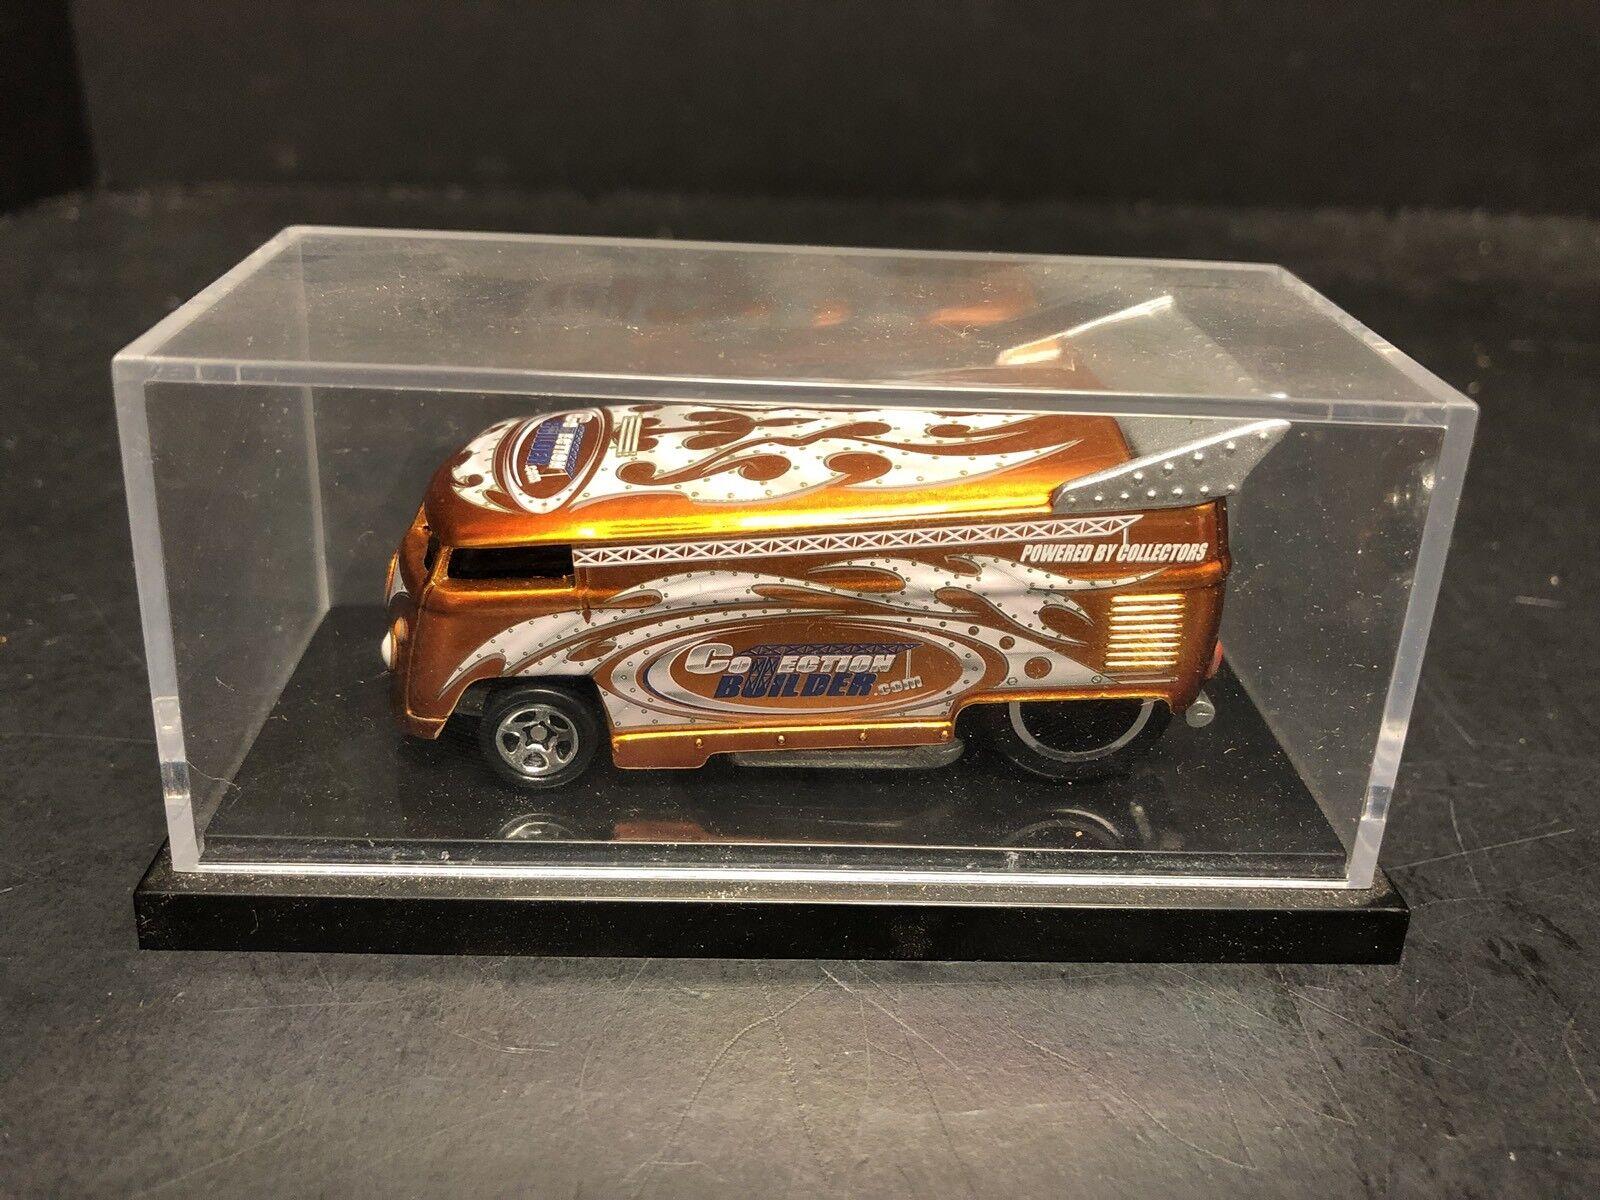 Hot Wheels Liberty Promotions VW Drag Bus Collectionbuilder Collectionbuilder Collectionbuilder  1031 1300 CC0157 8465a6